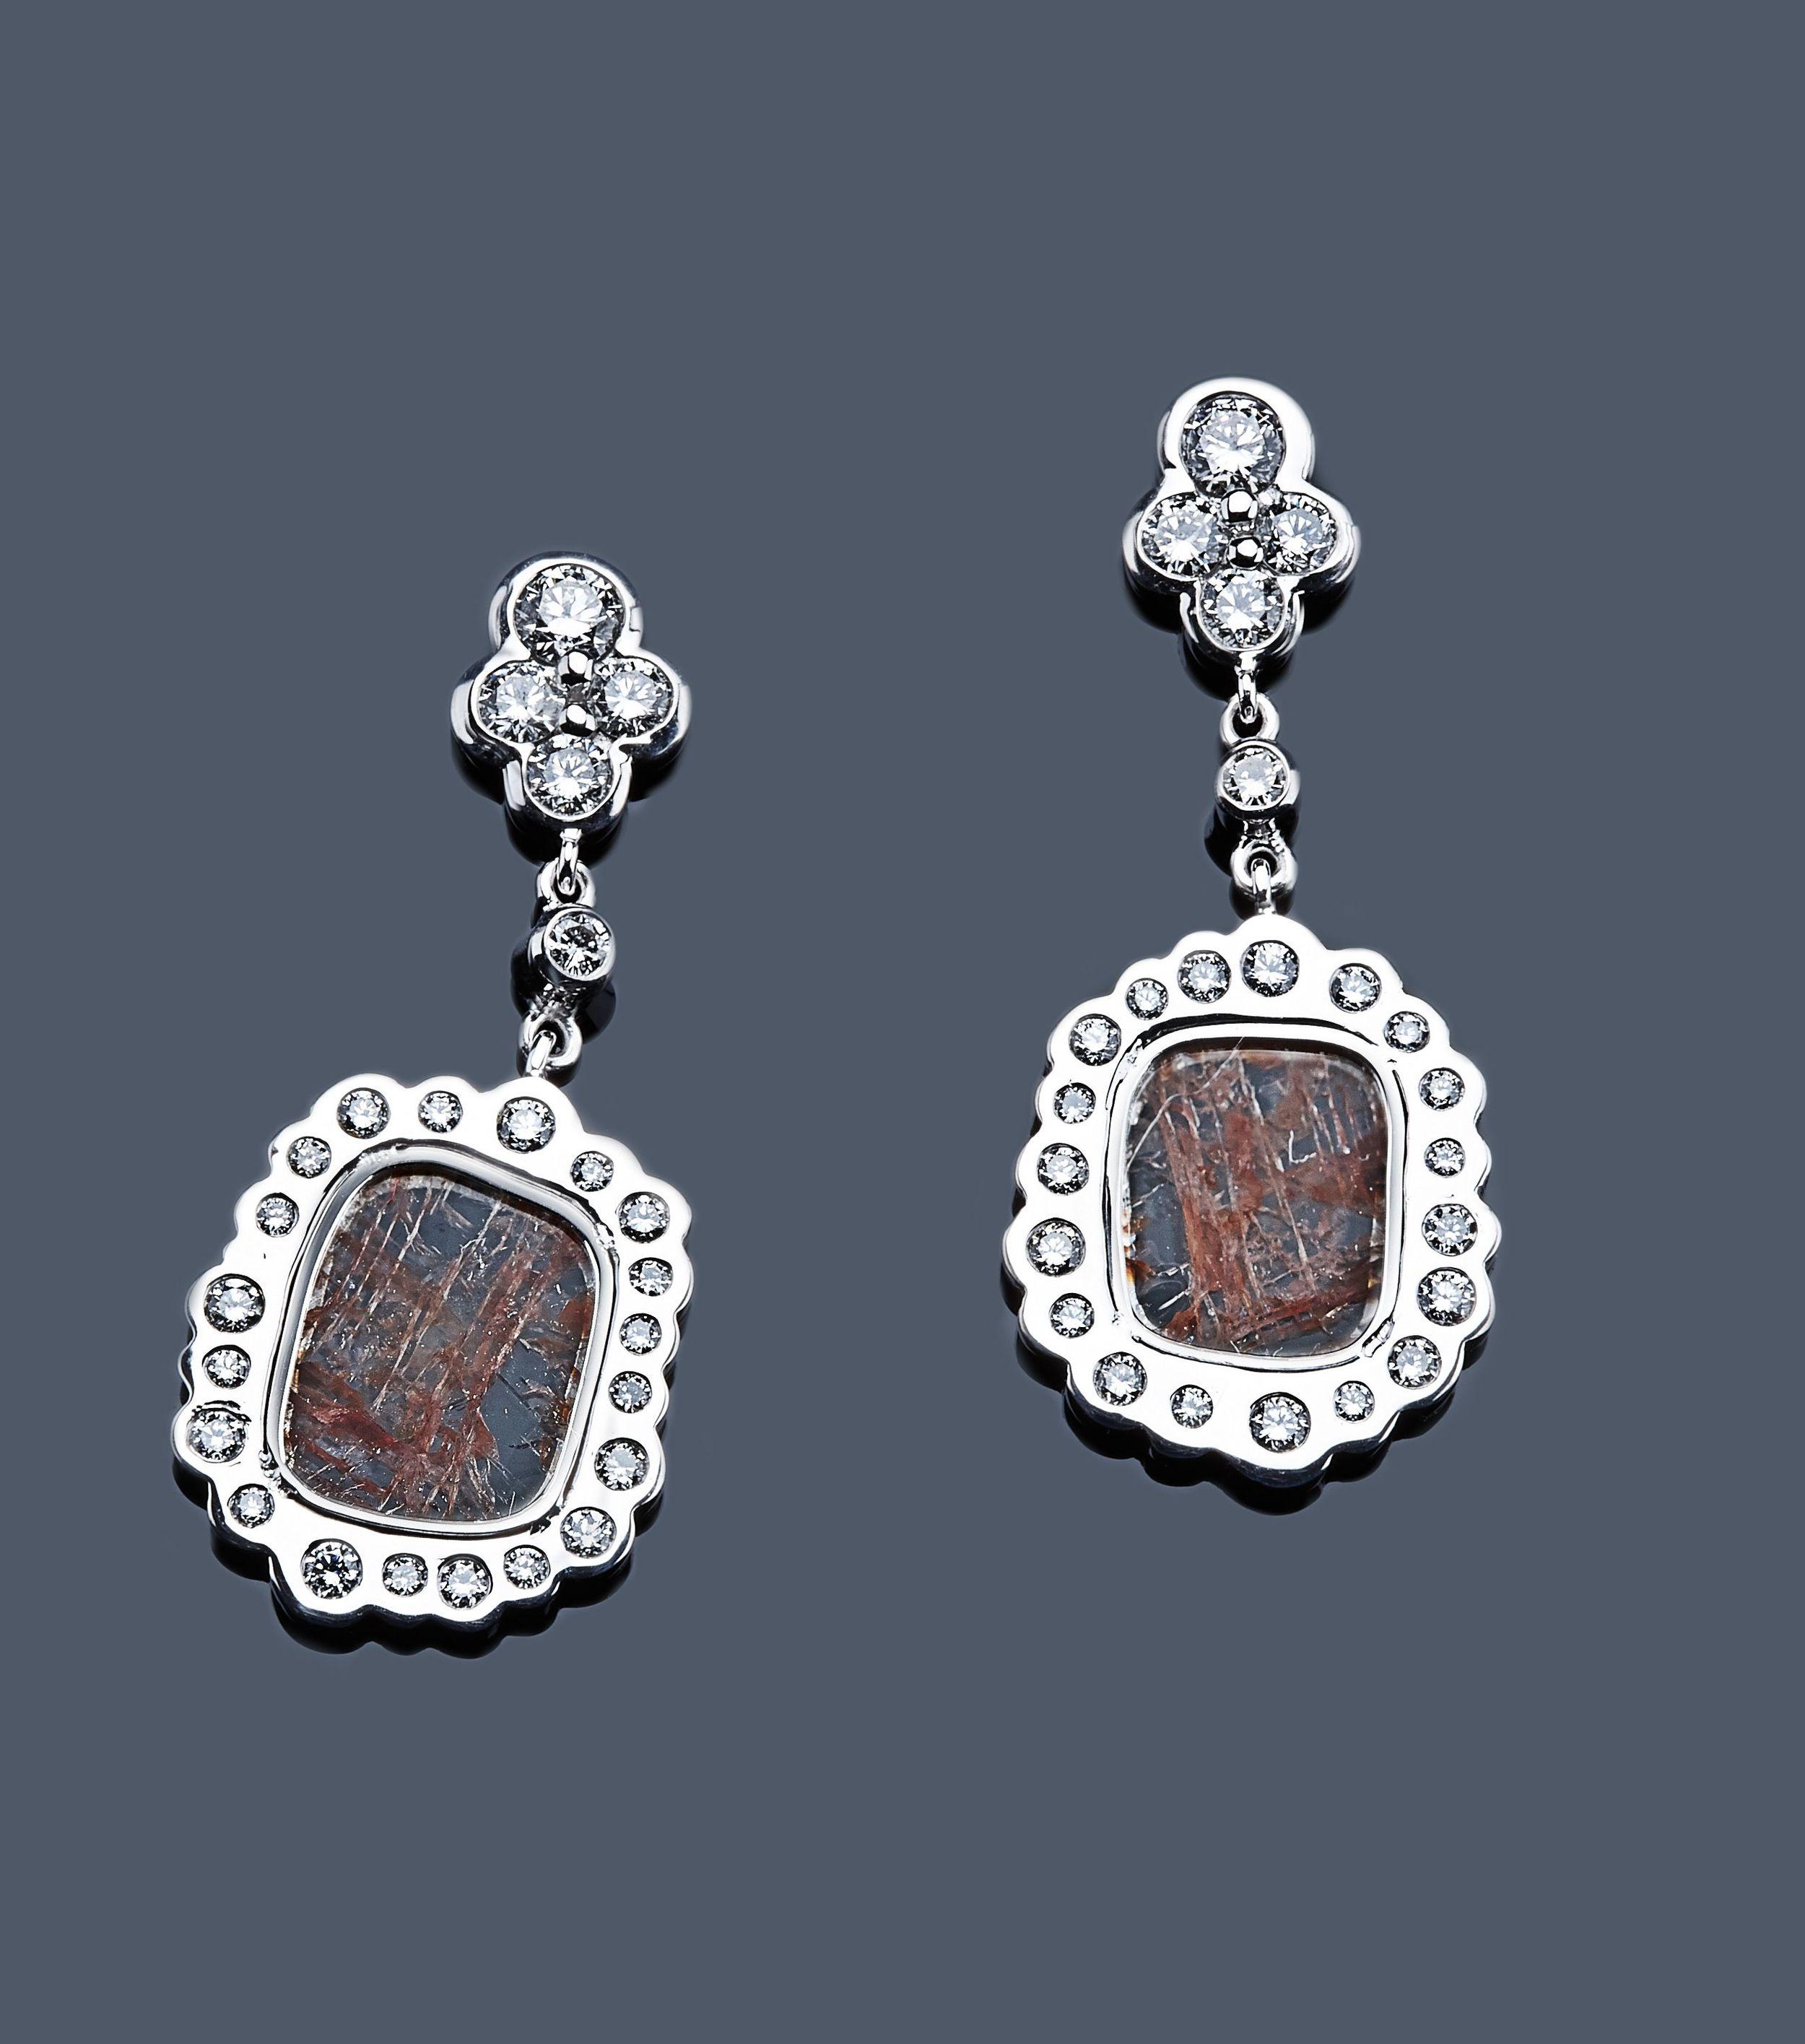 Earrings featuring finely sliced diamonds